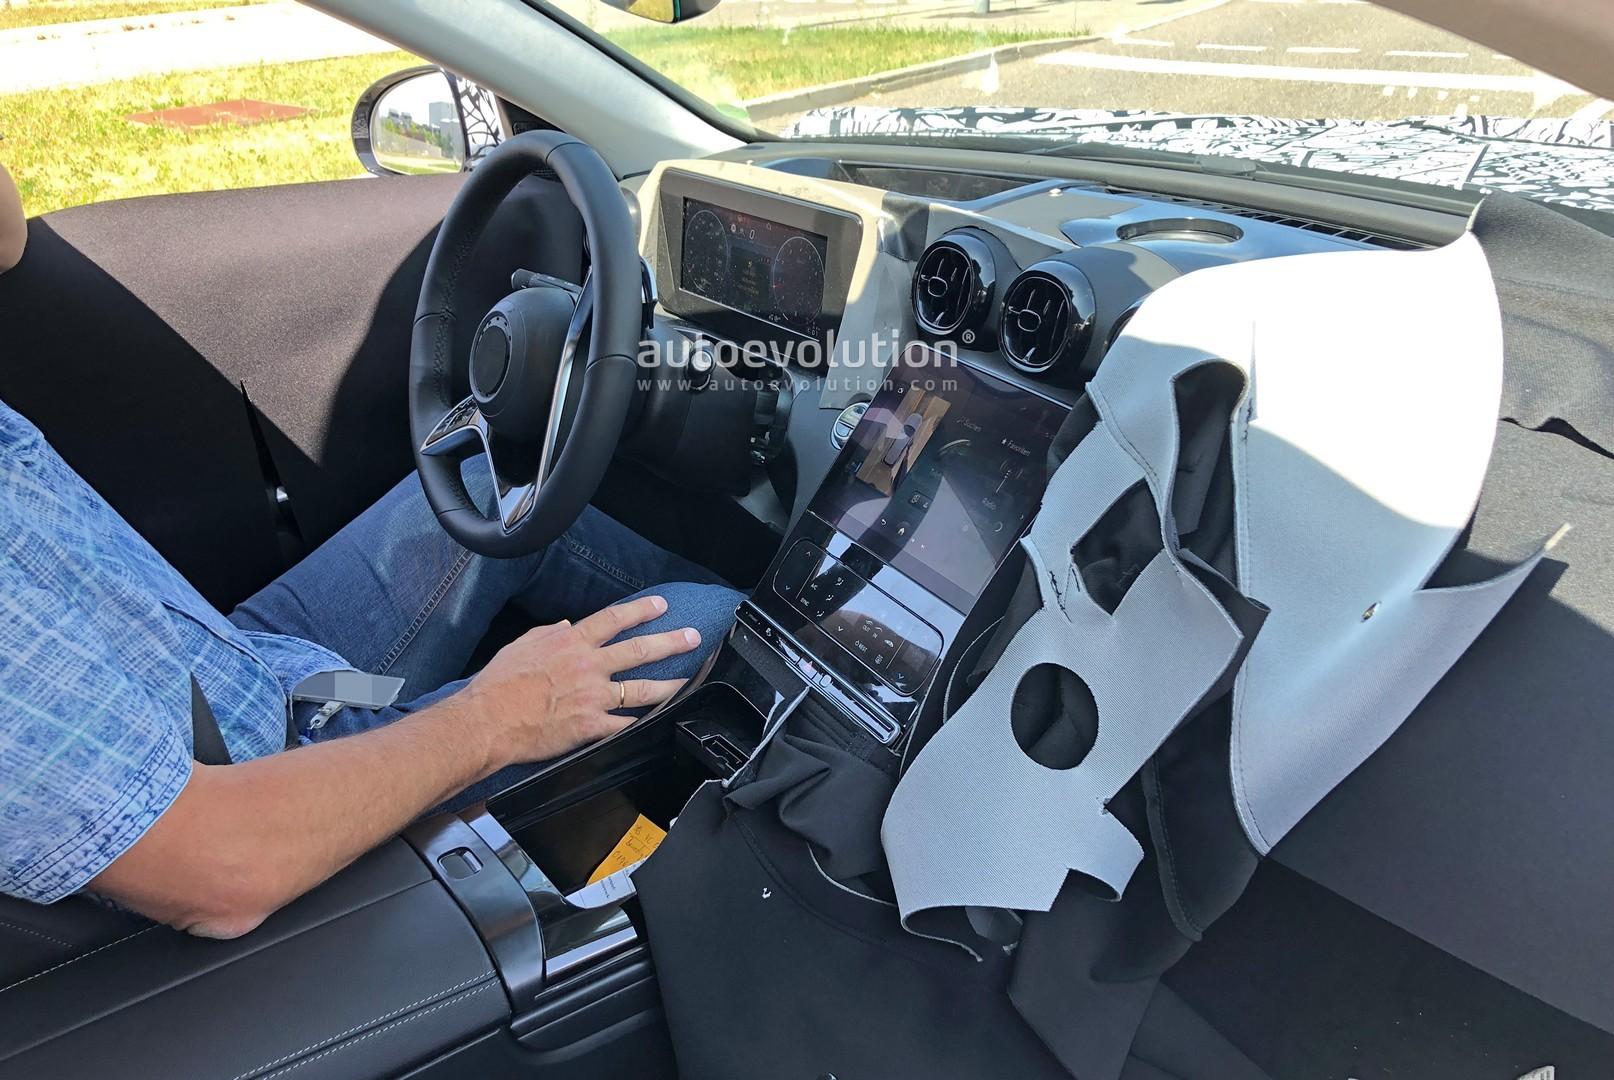 2021 Mercedes C-Class Interior Spied in Detail, Looks ...